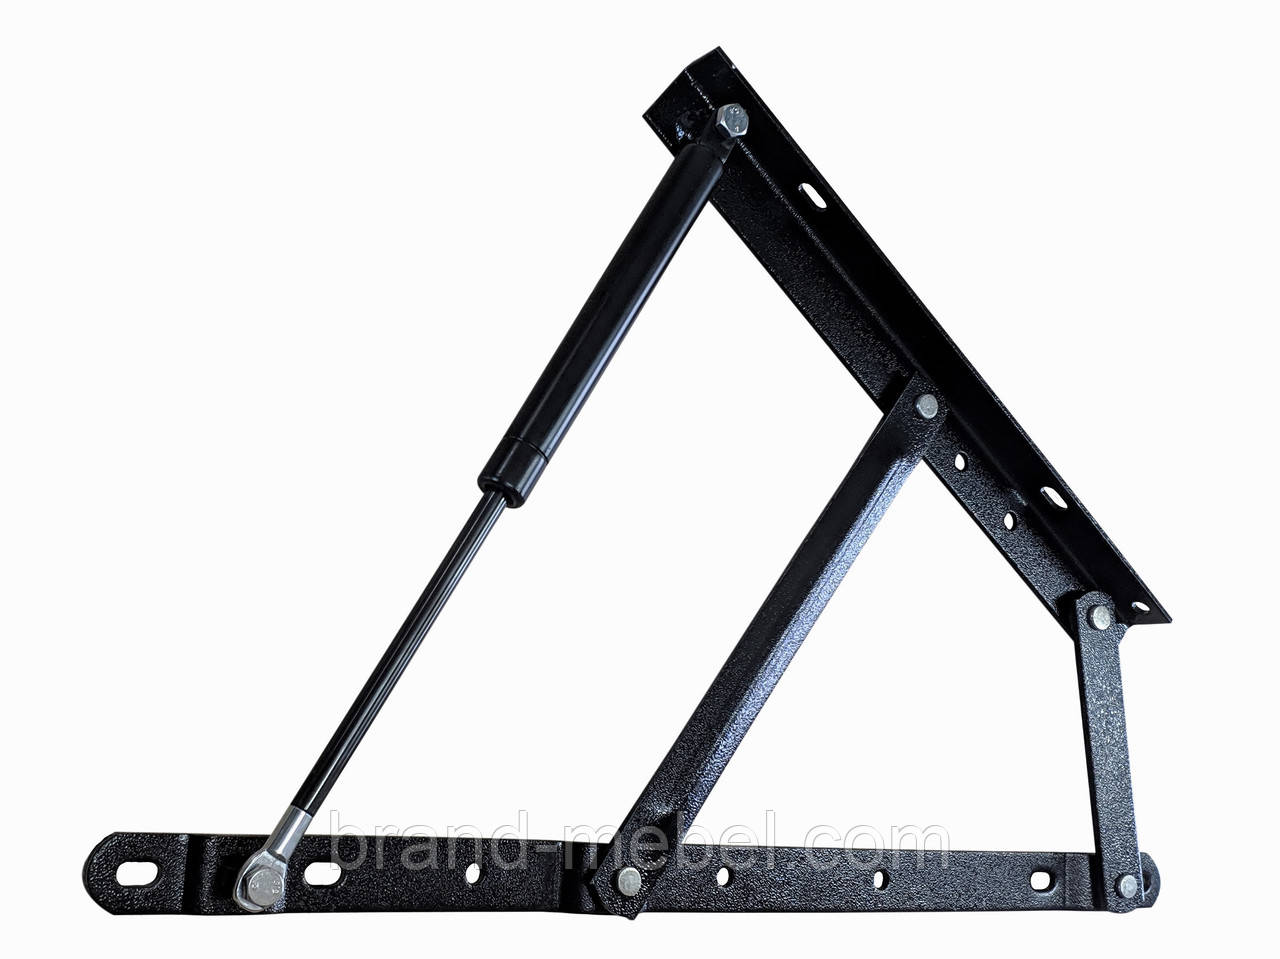 Brand-mebel / Механизм подъёма кровати на газовых амортизаторах Эксан 1500N